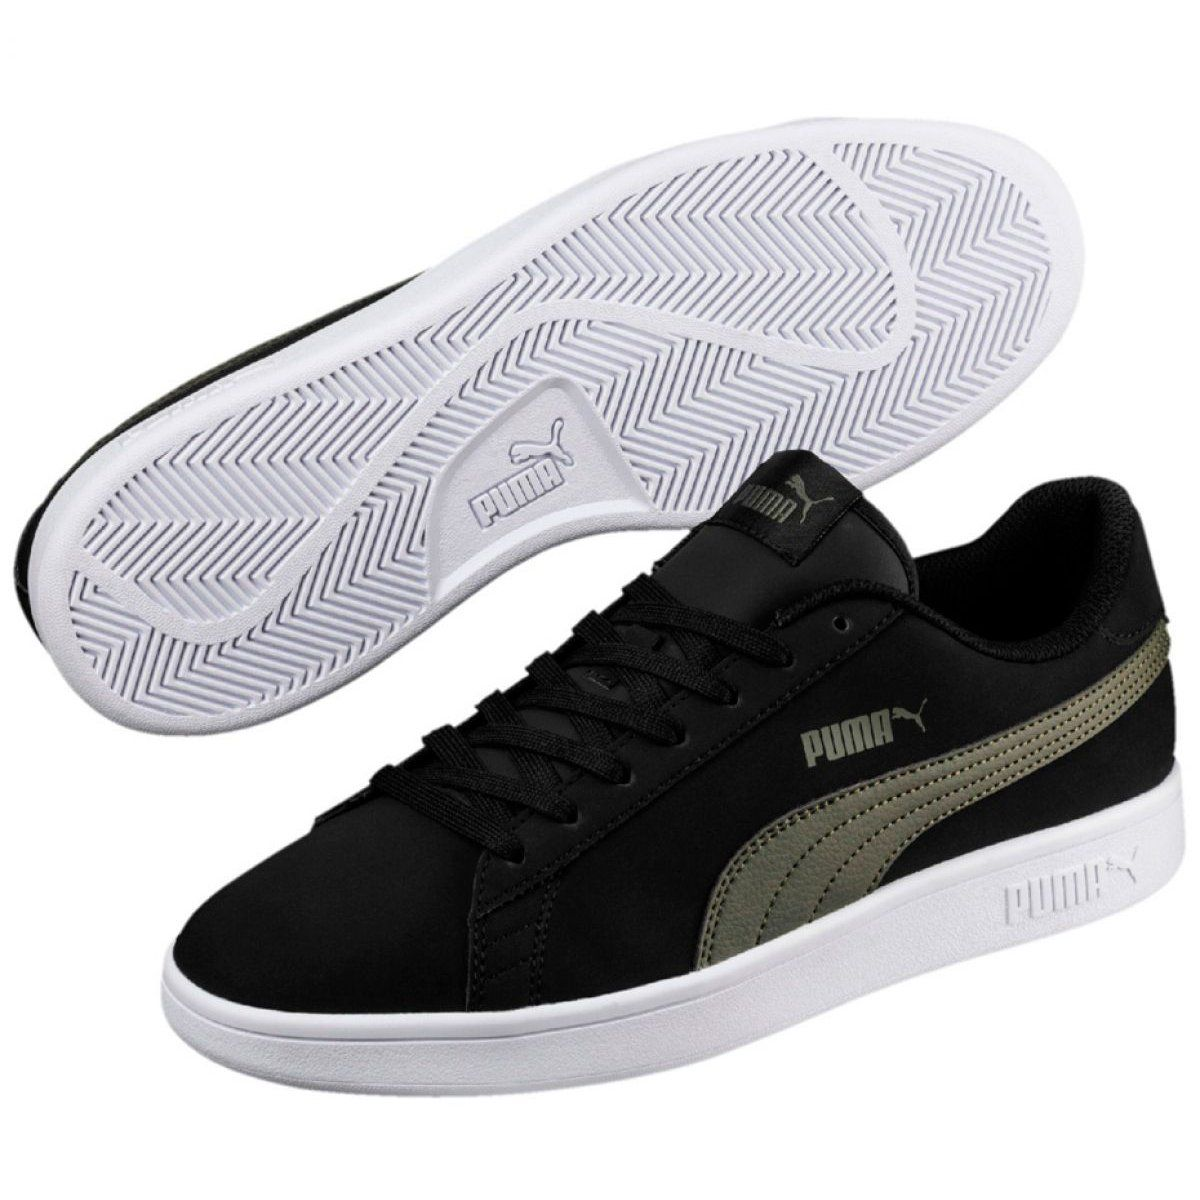 Sportowe Meskie Innamarka Buty Puma Smash V2 Buck M 365160 05 Czarne Leather Slip On Shoes Puma Running Shoes Junior Sneakers